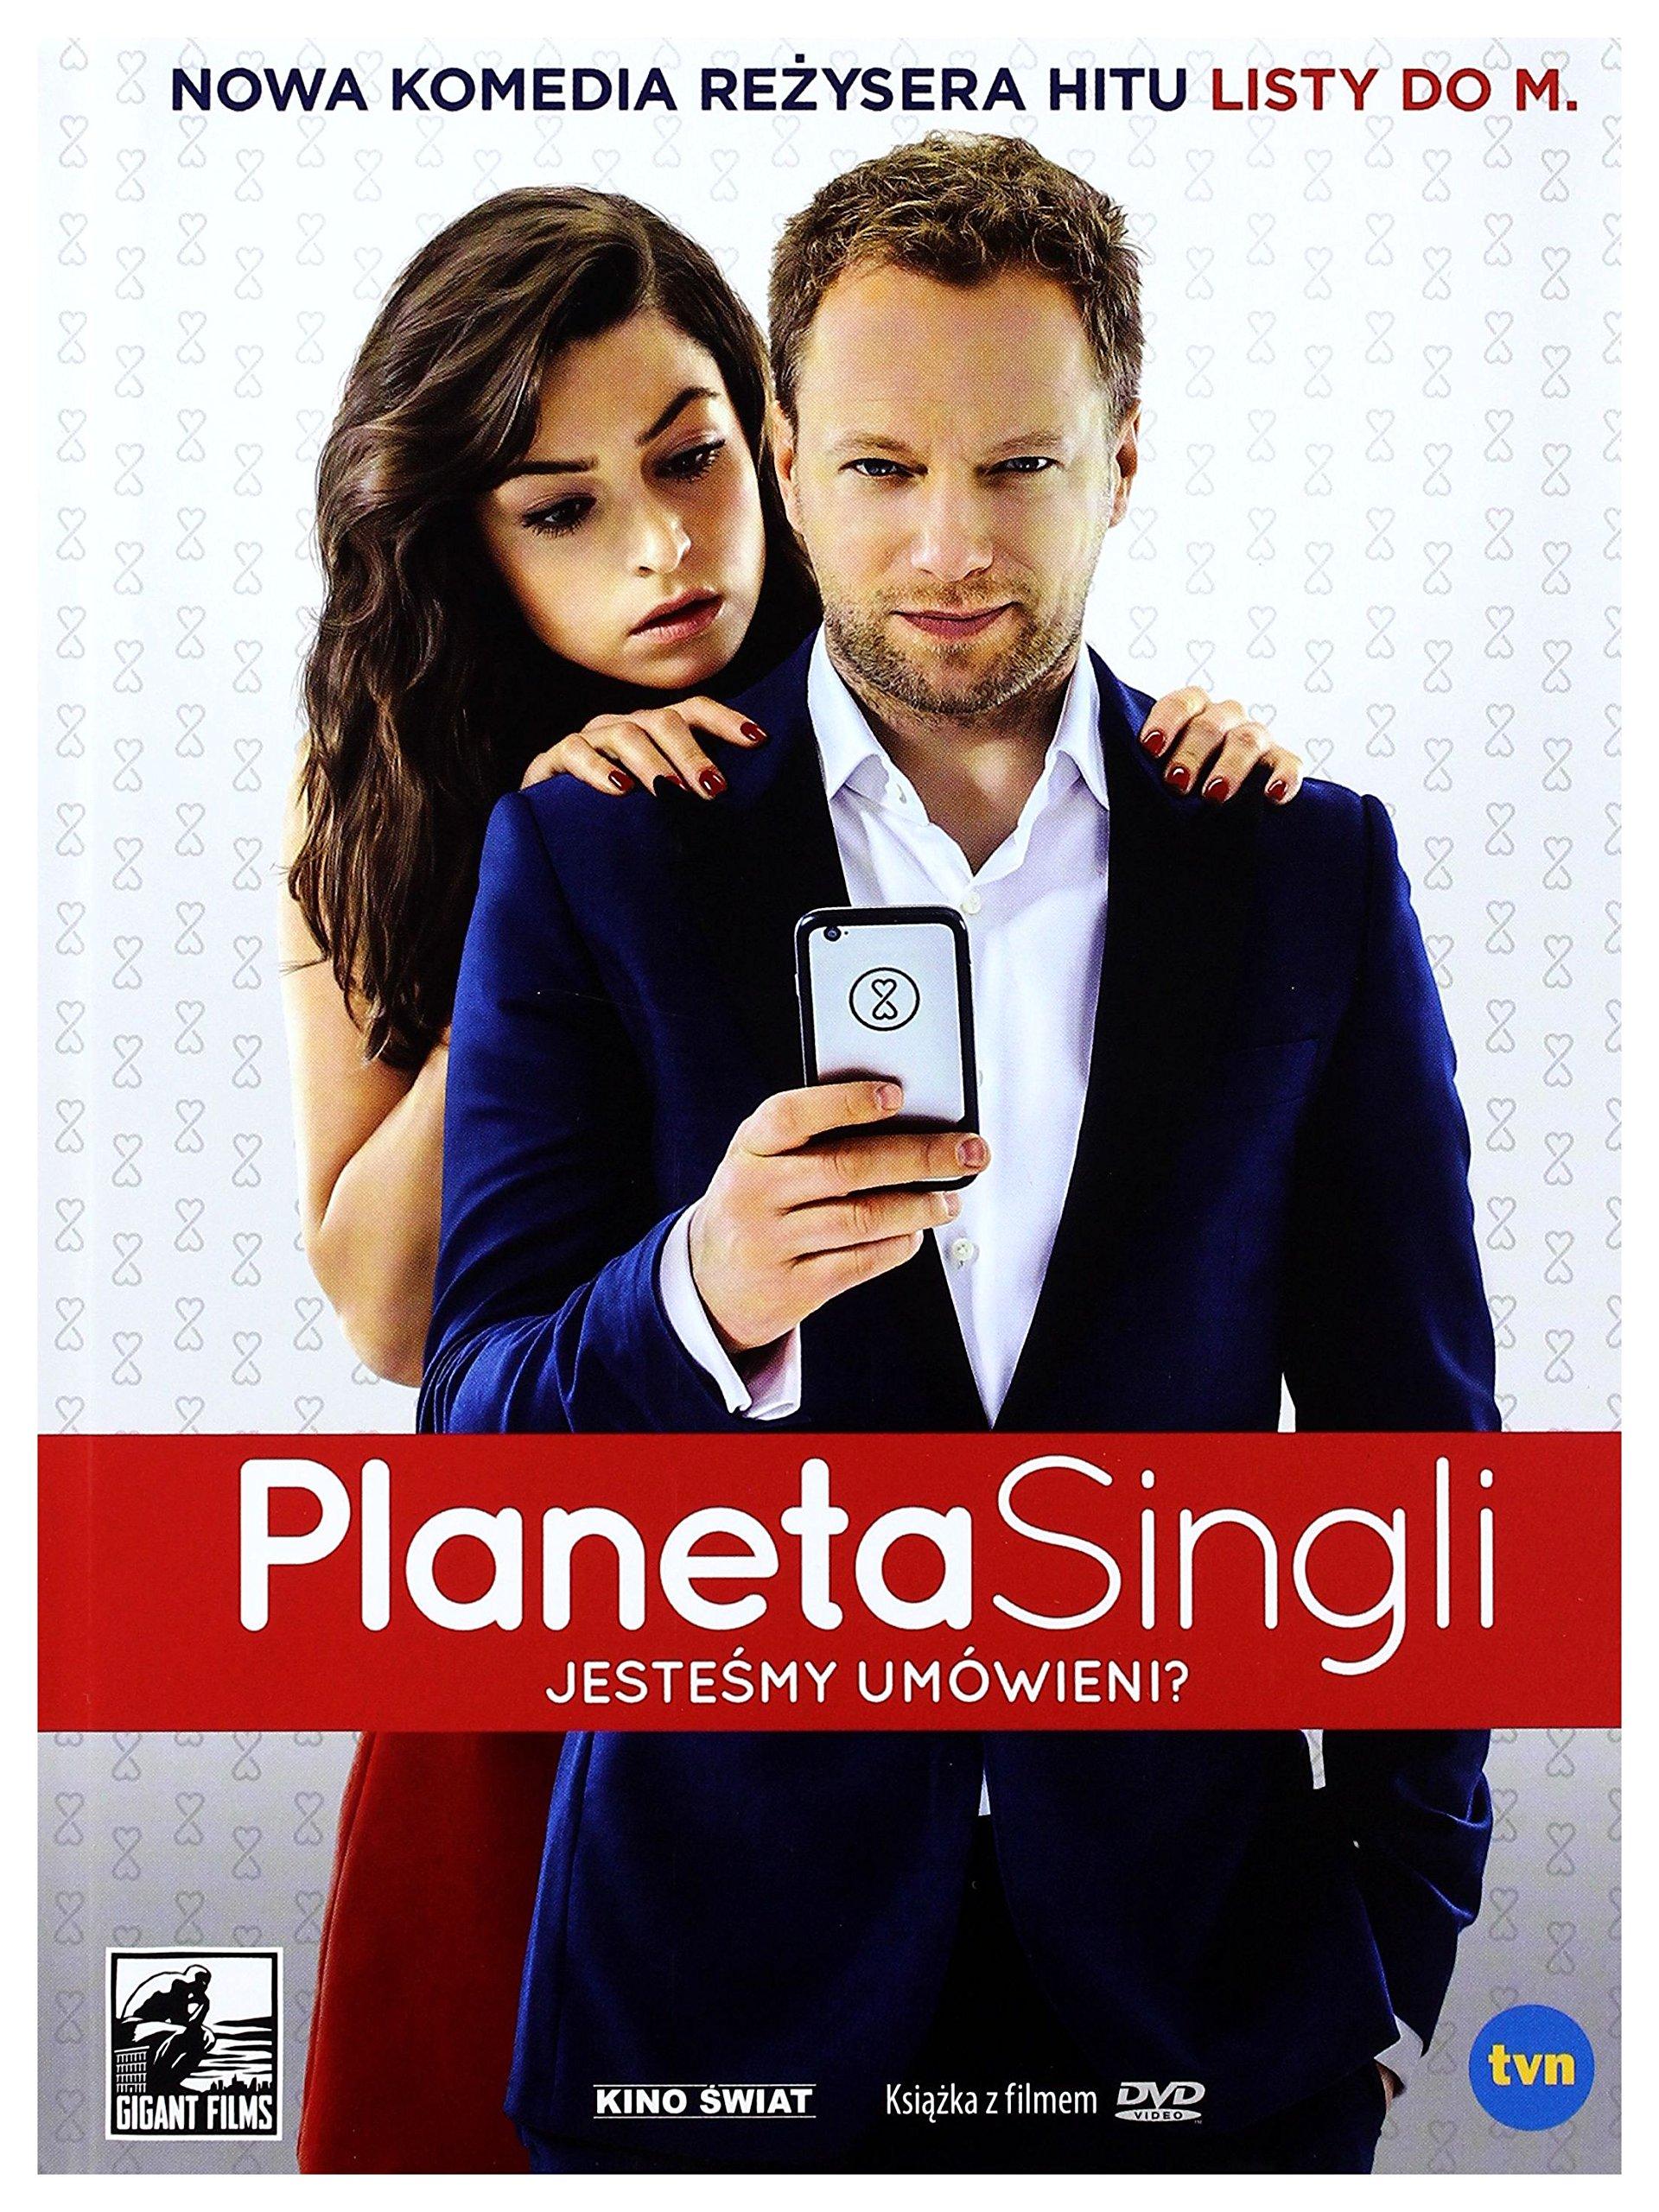 Planeta singli [DVD] (English subtitles)